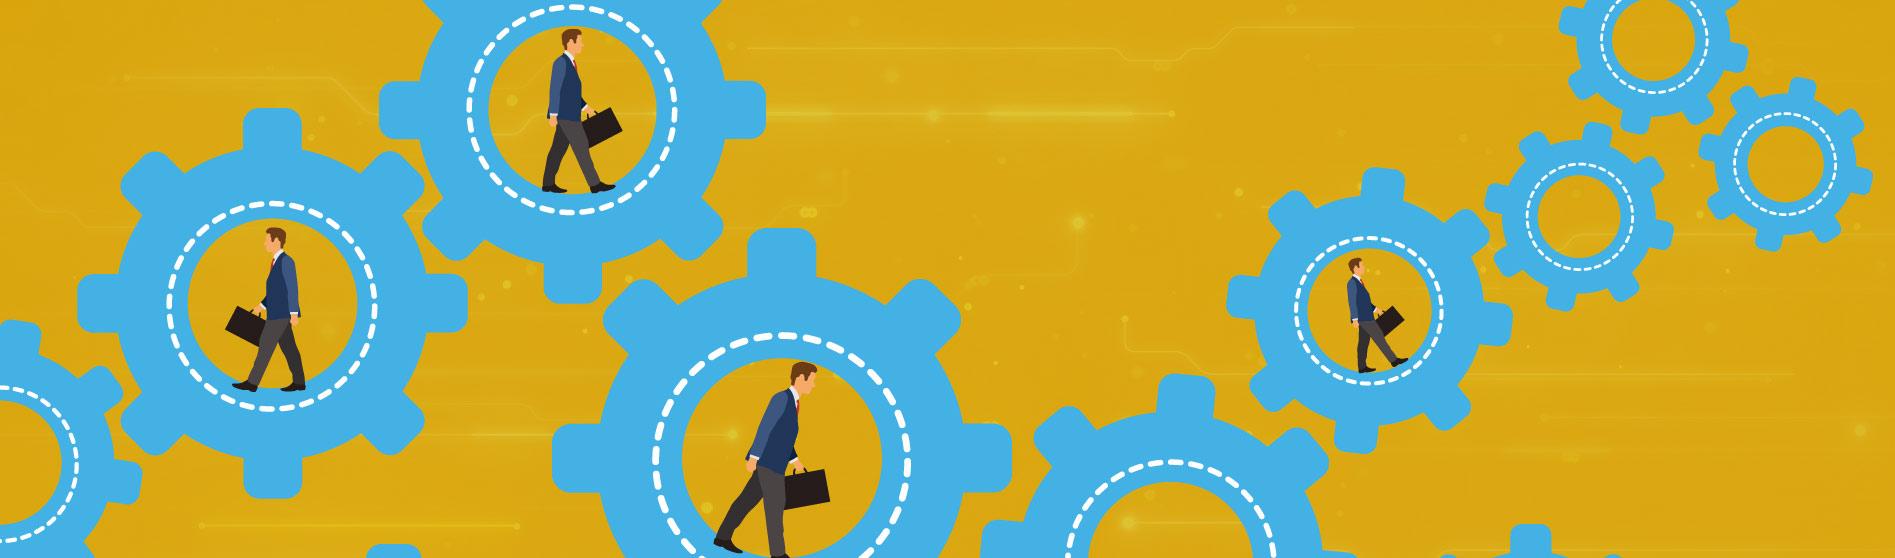 Companies embrace business automation